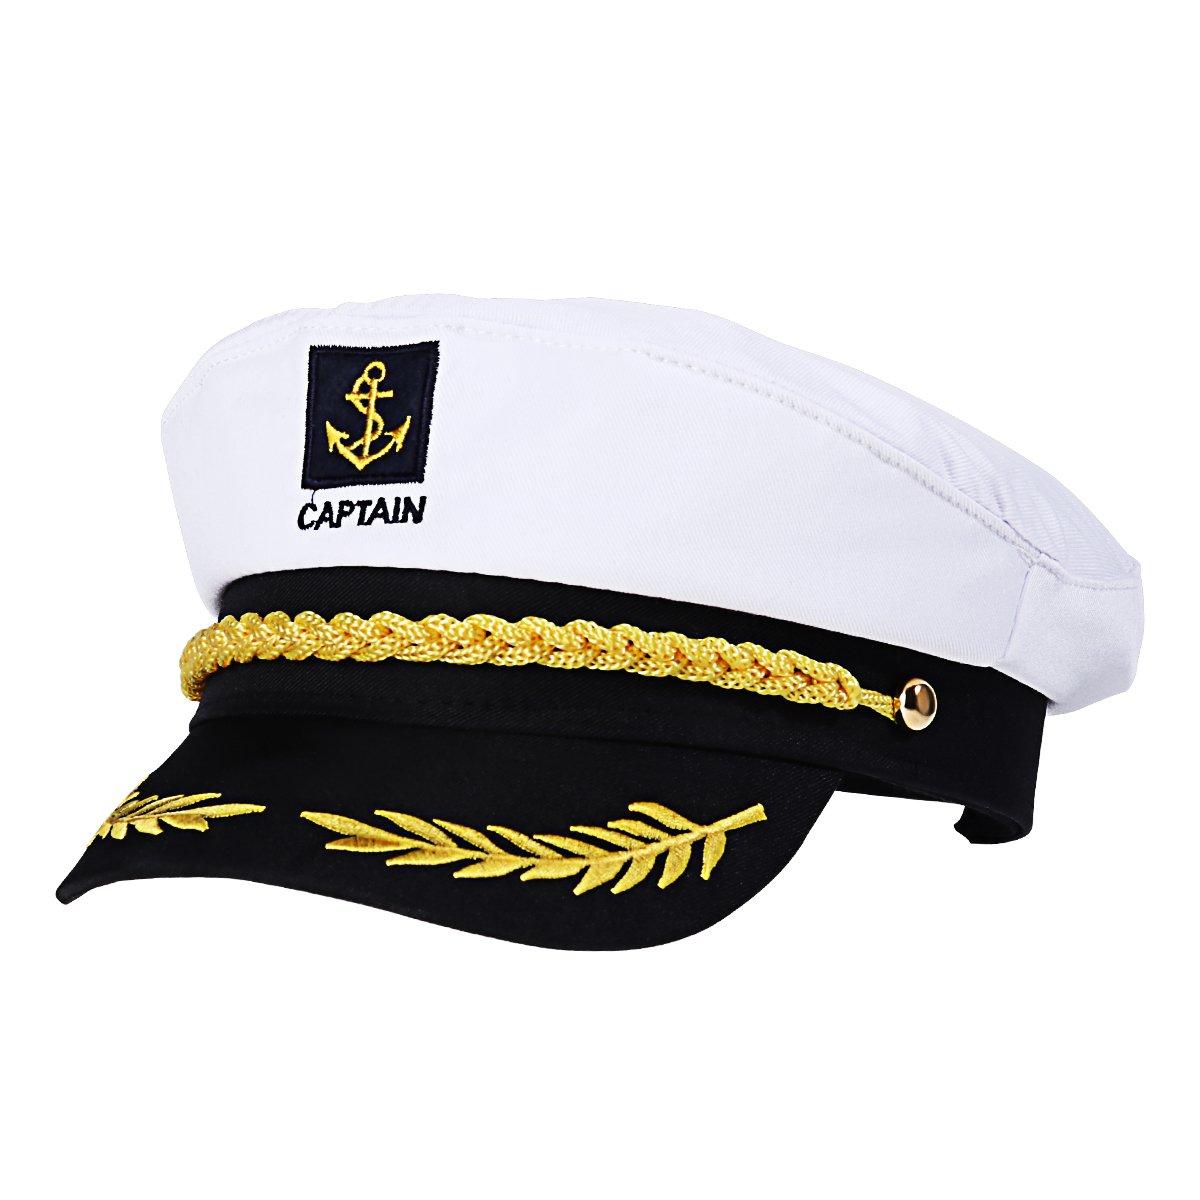 Amosfun Capitán Adulto Sombrero de Cosplay Gorra Yate Barco Navegante Marinero Almirante Marino (Blanco)